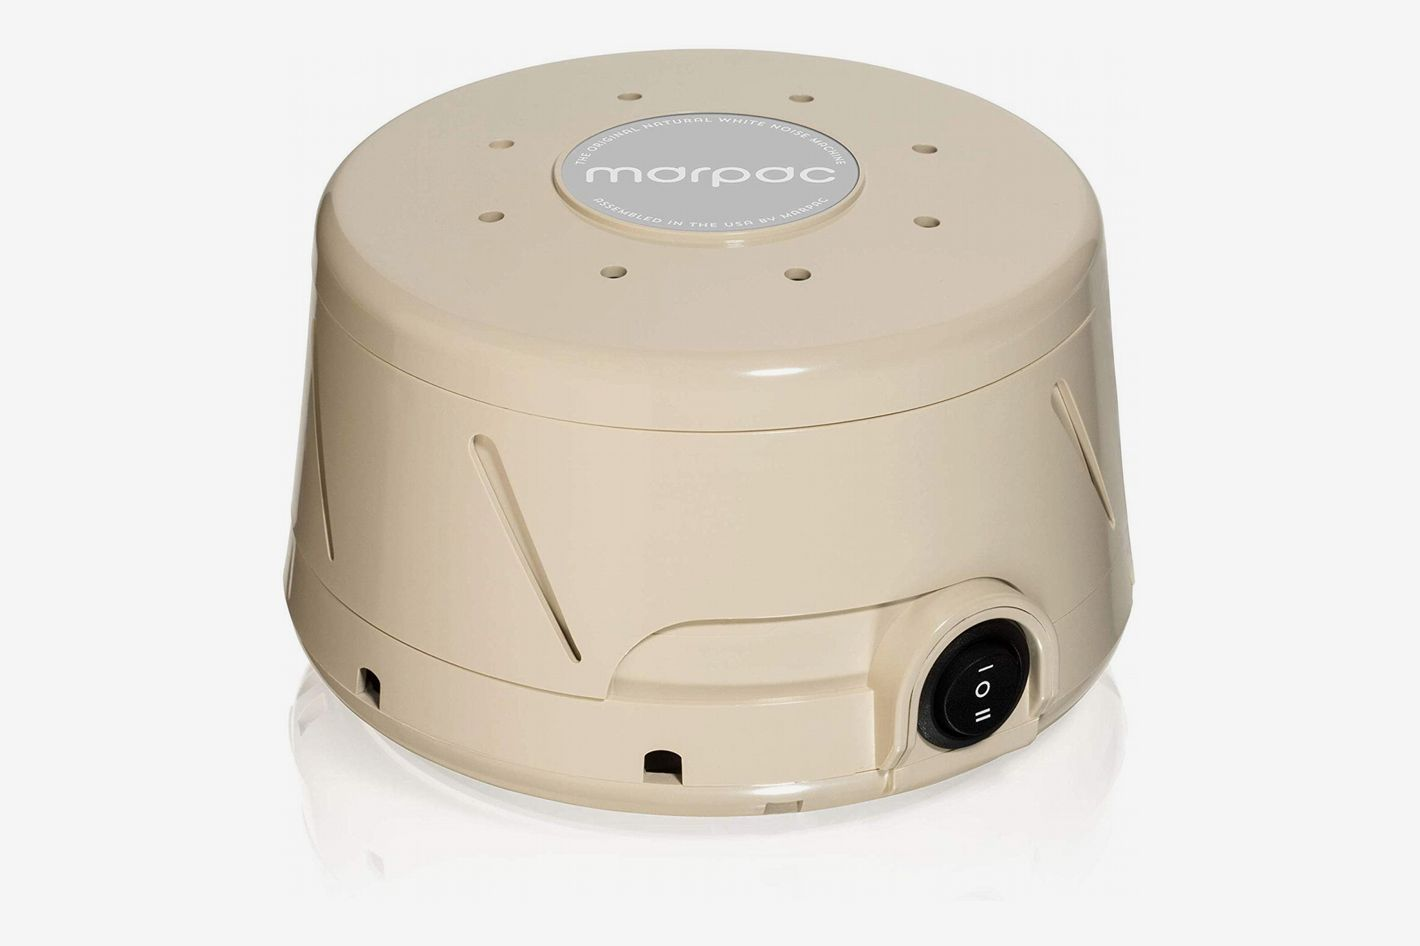 Marpac Dohm Classic White-Noise Sound Machine